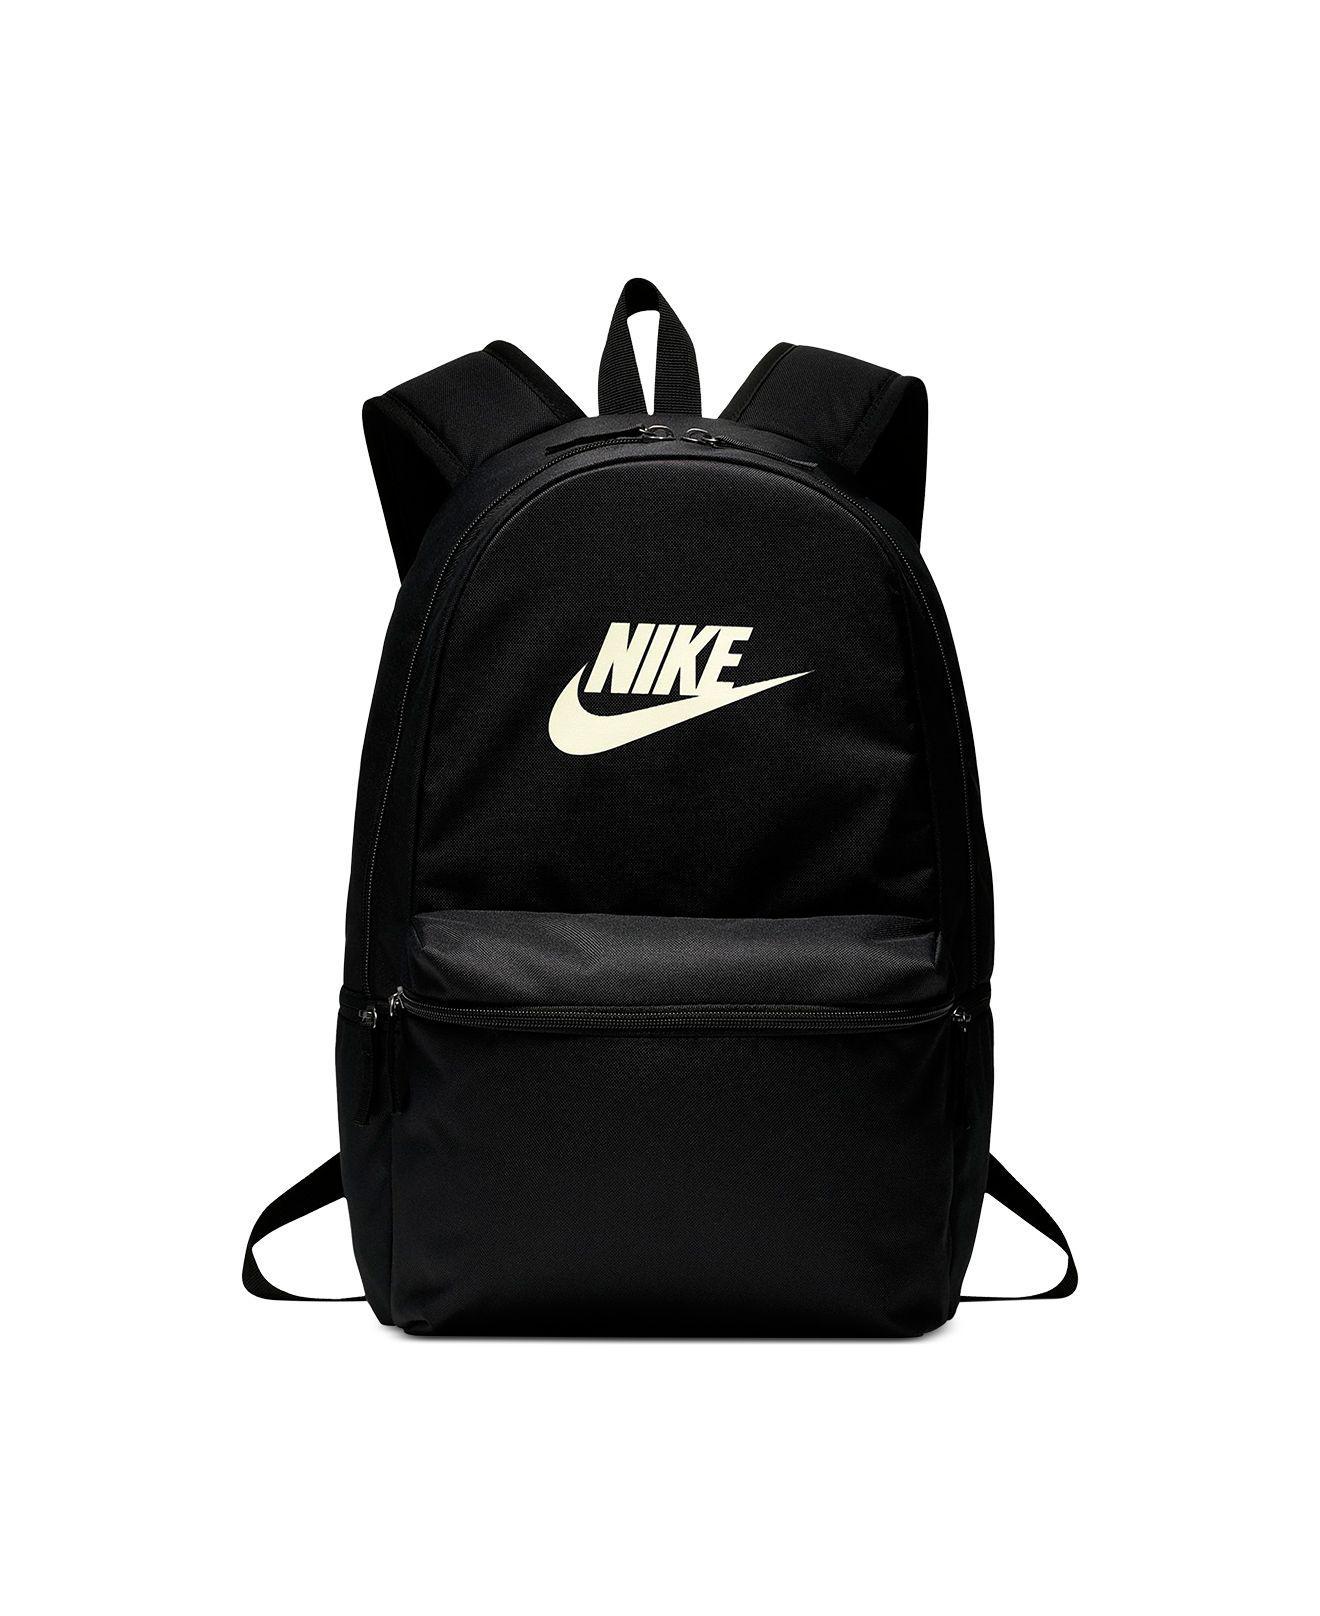 Lyst - Nike Heritage Metallic-logo Backpack in Black e6661a420